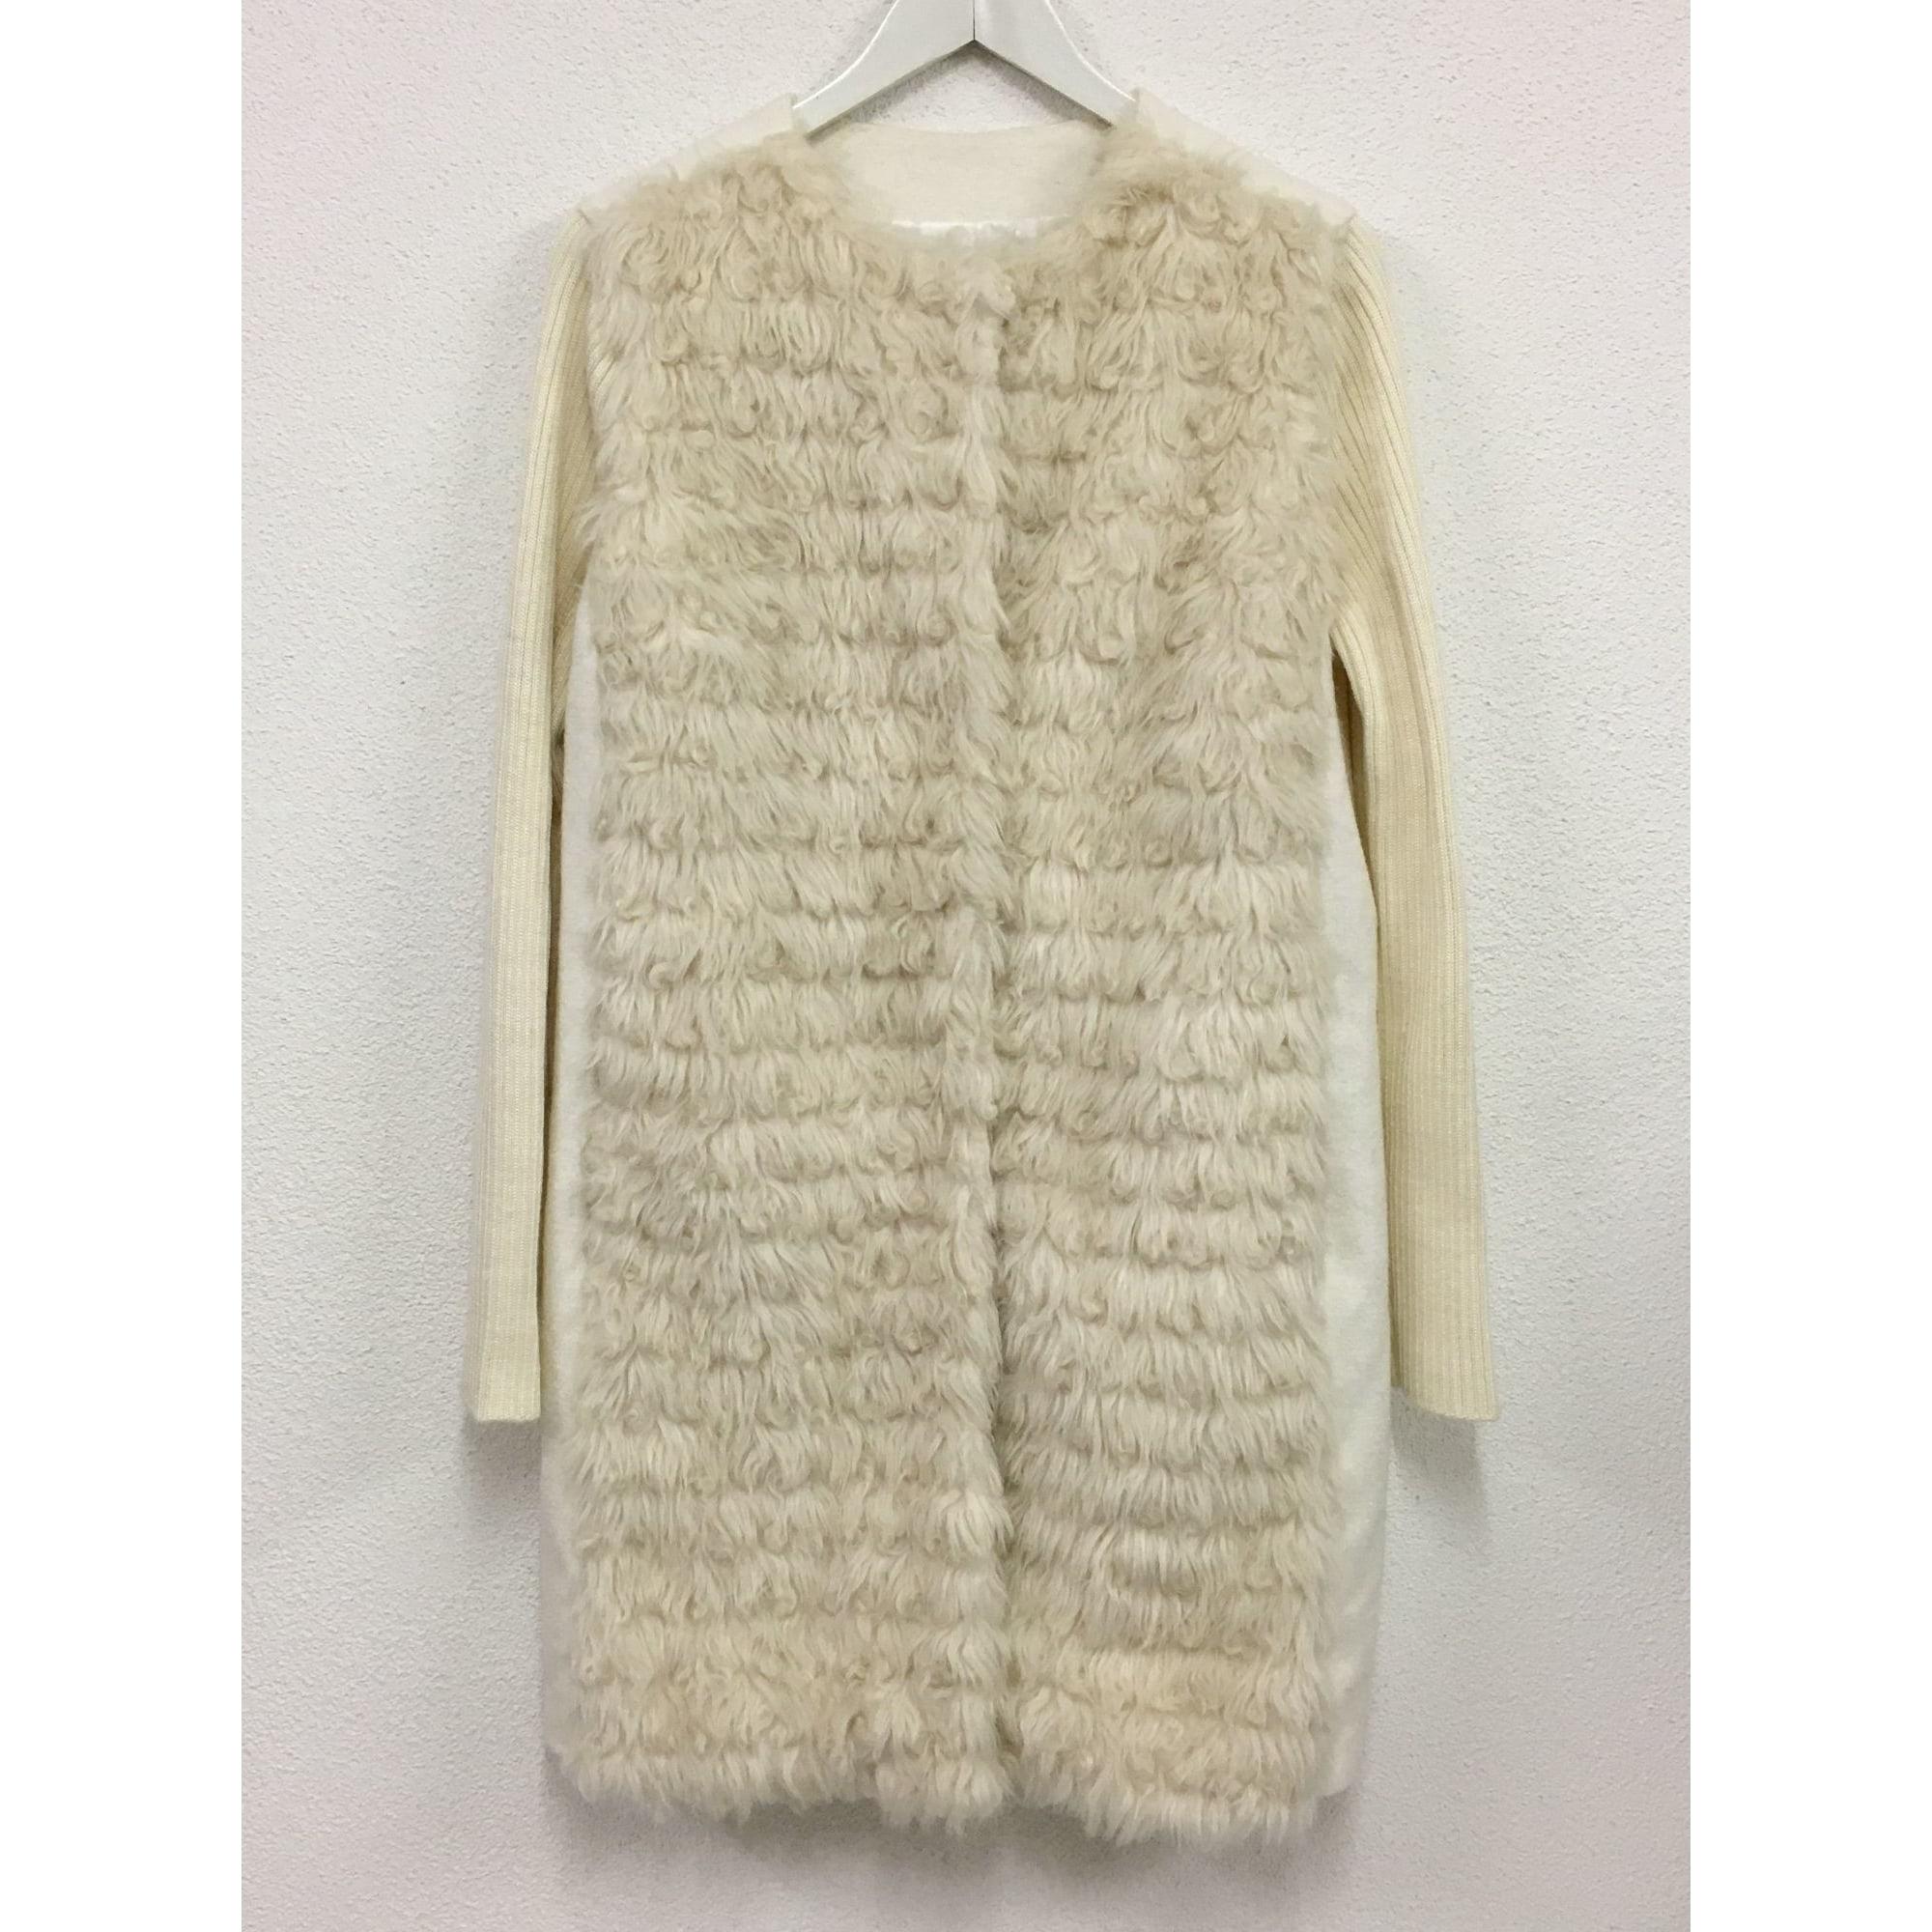 Manteau en fourrure MARIA GRAZIA SEVERI Blanc, blanc cassé, écru